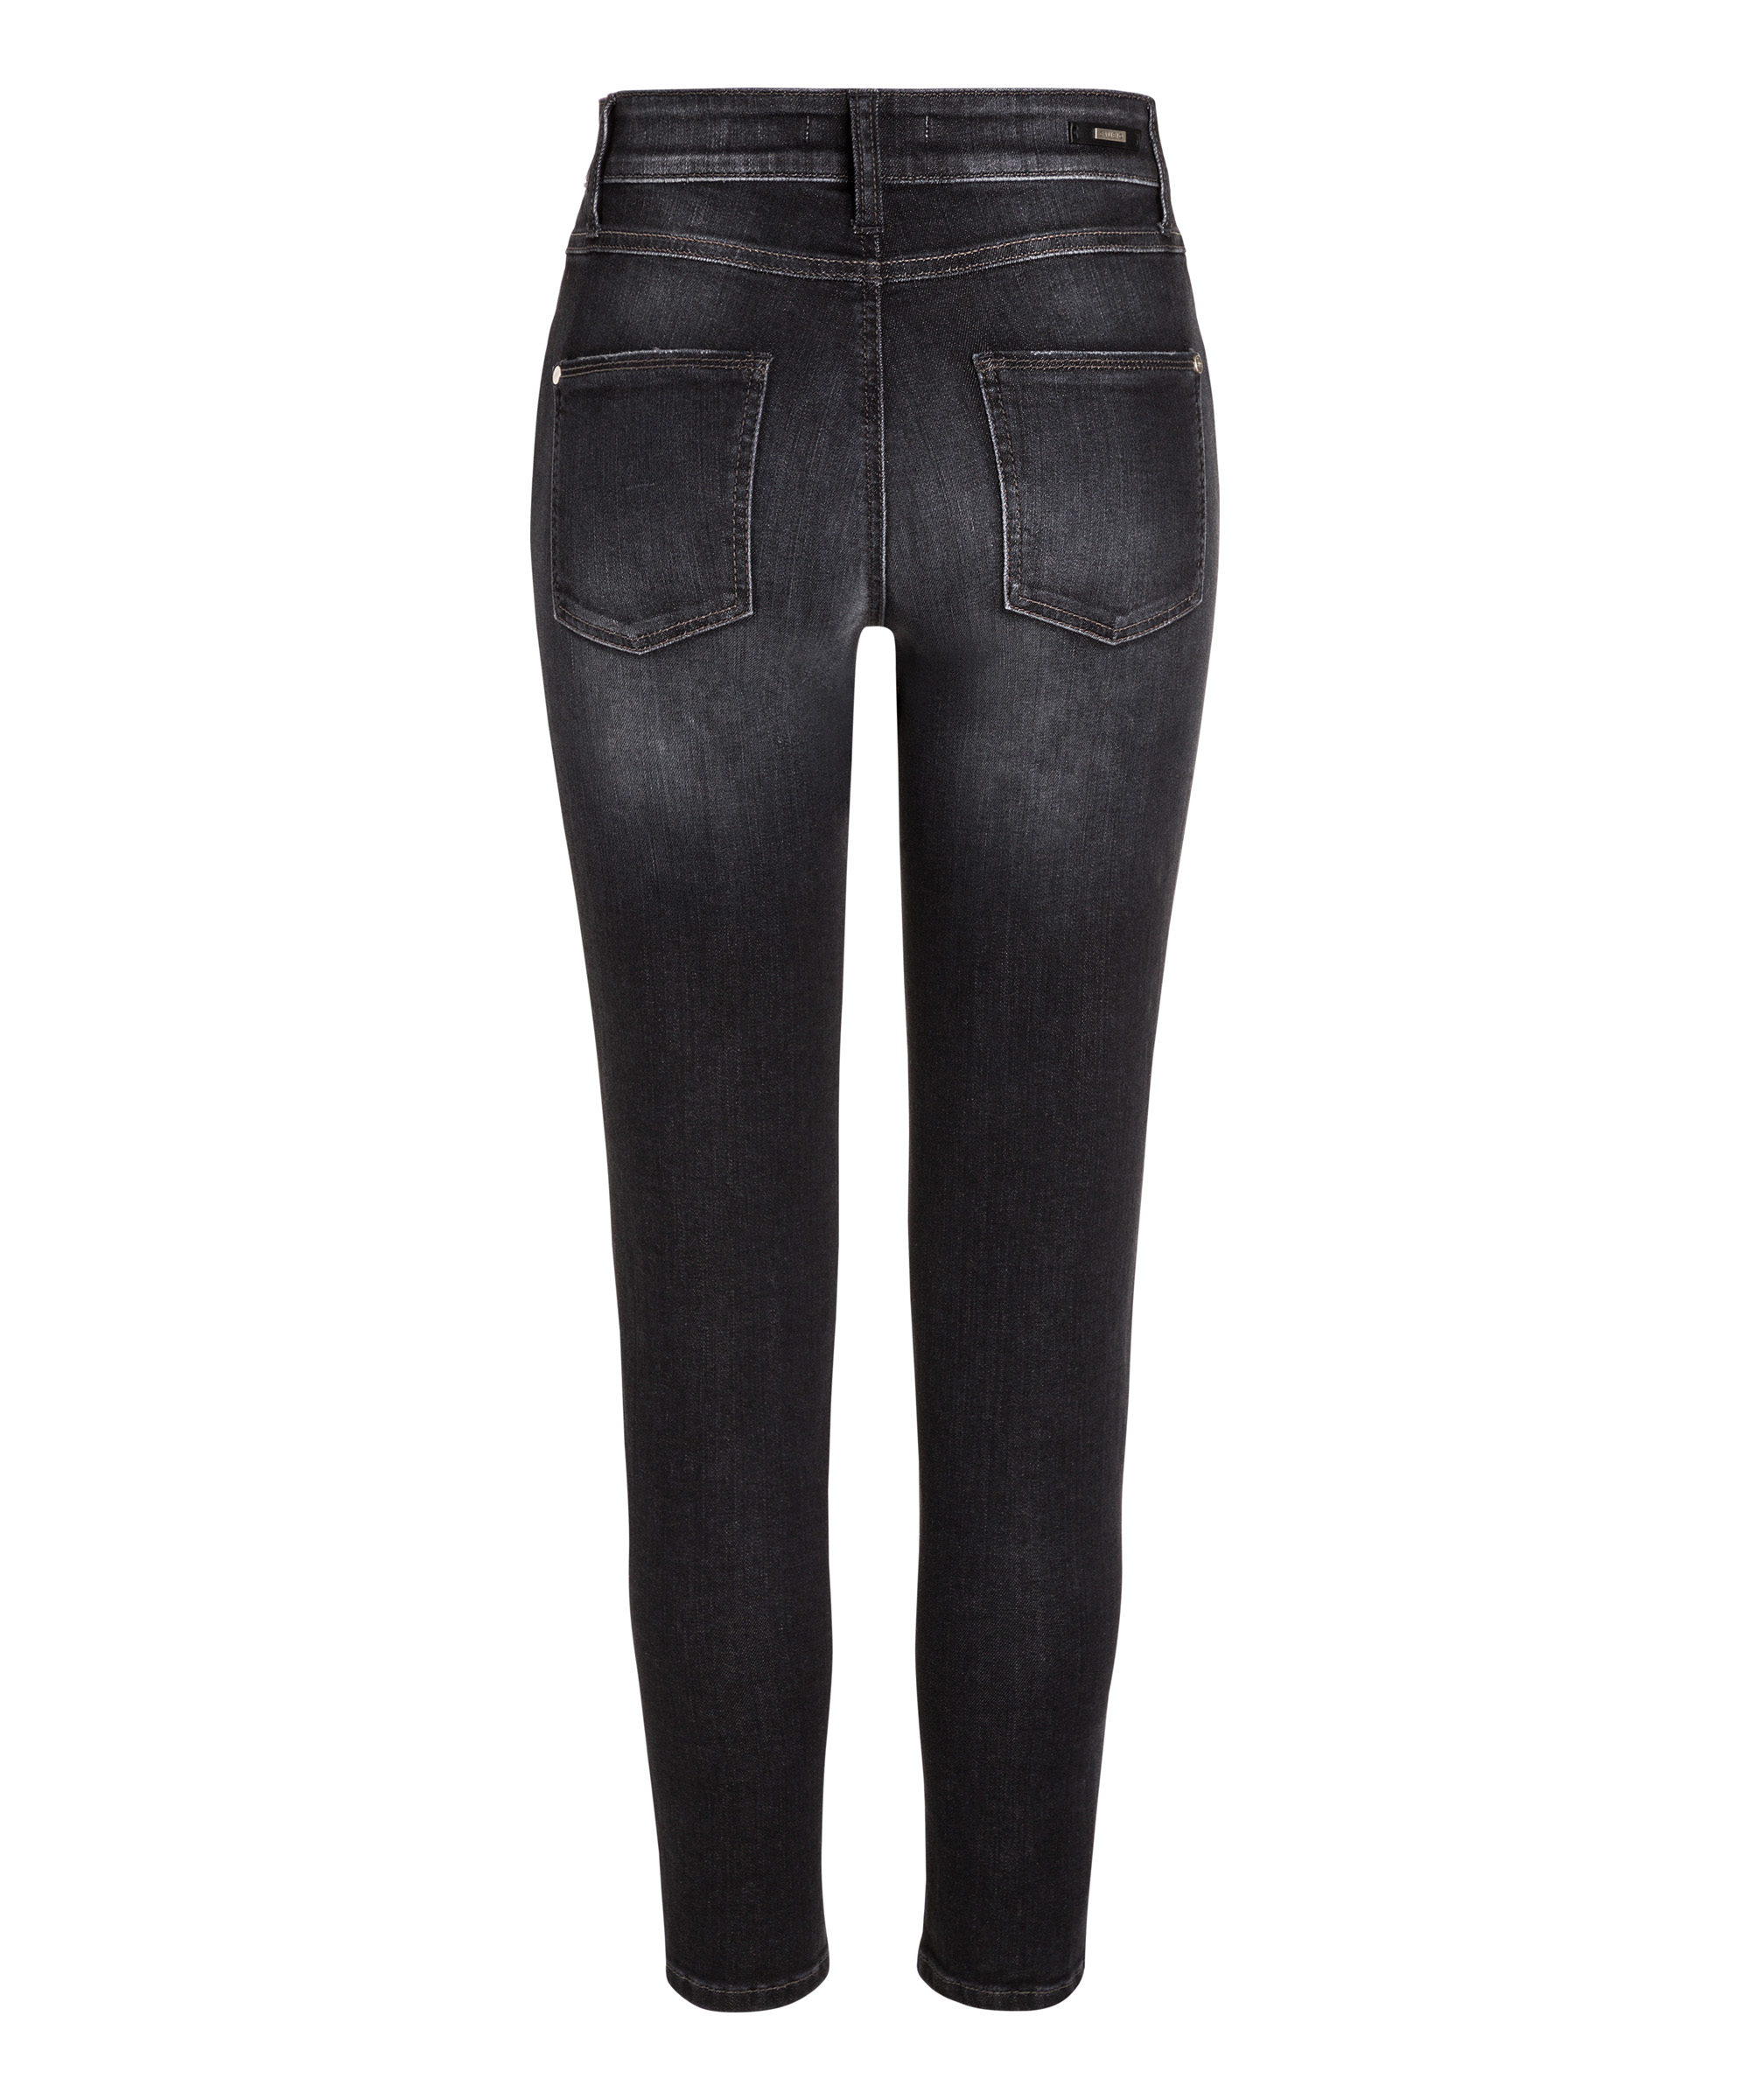 Cambio Jeans Posh MEDIUM USED